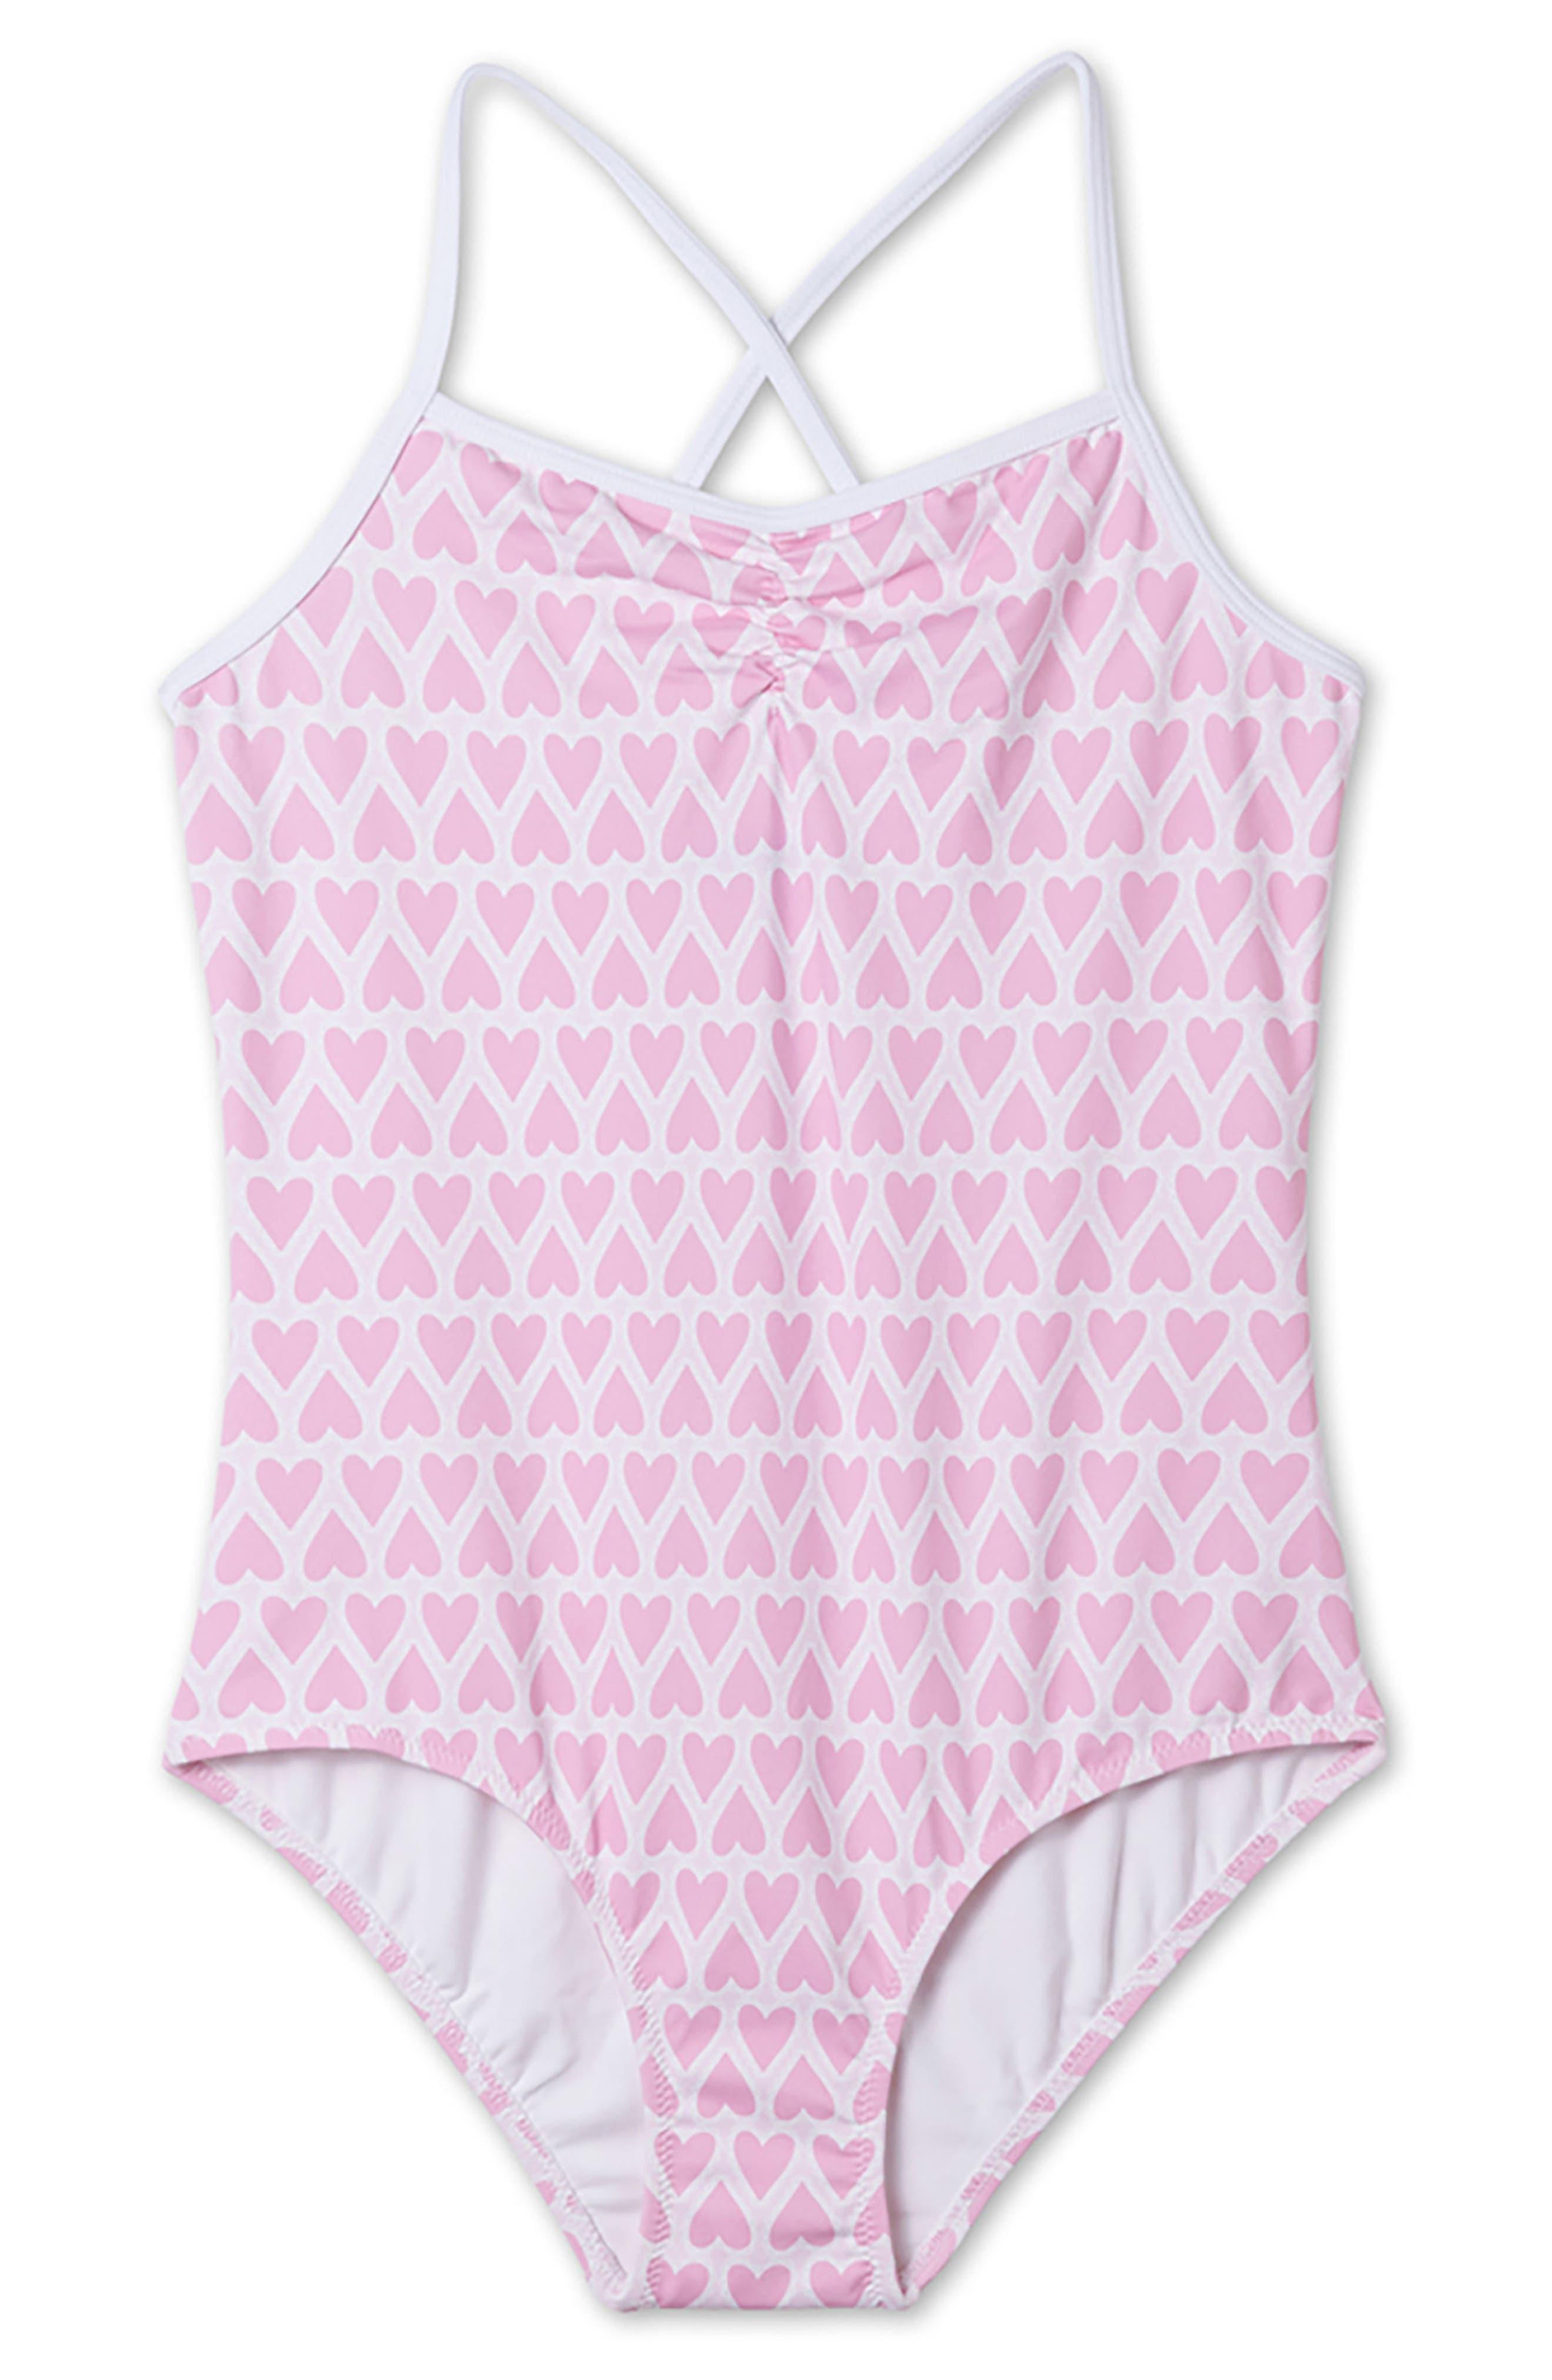 Main Image - Stella Cove Heart Print One-Piece Swimsuit (Little Girls & Big Girls)